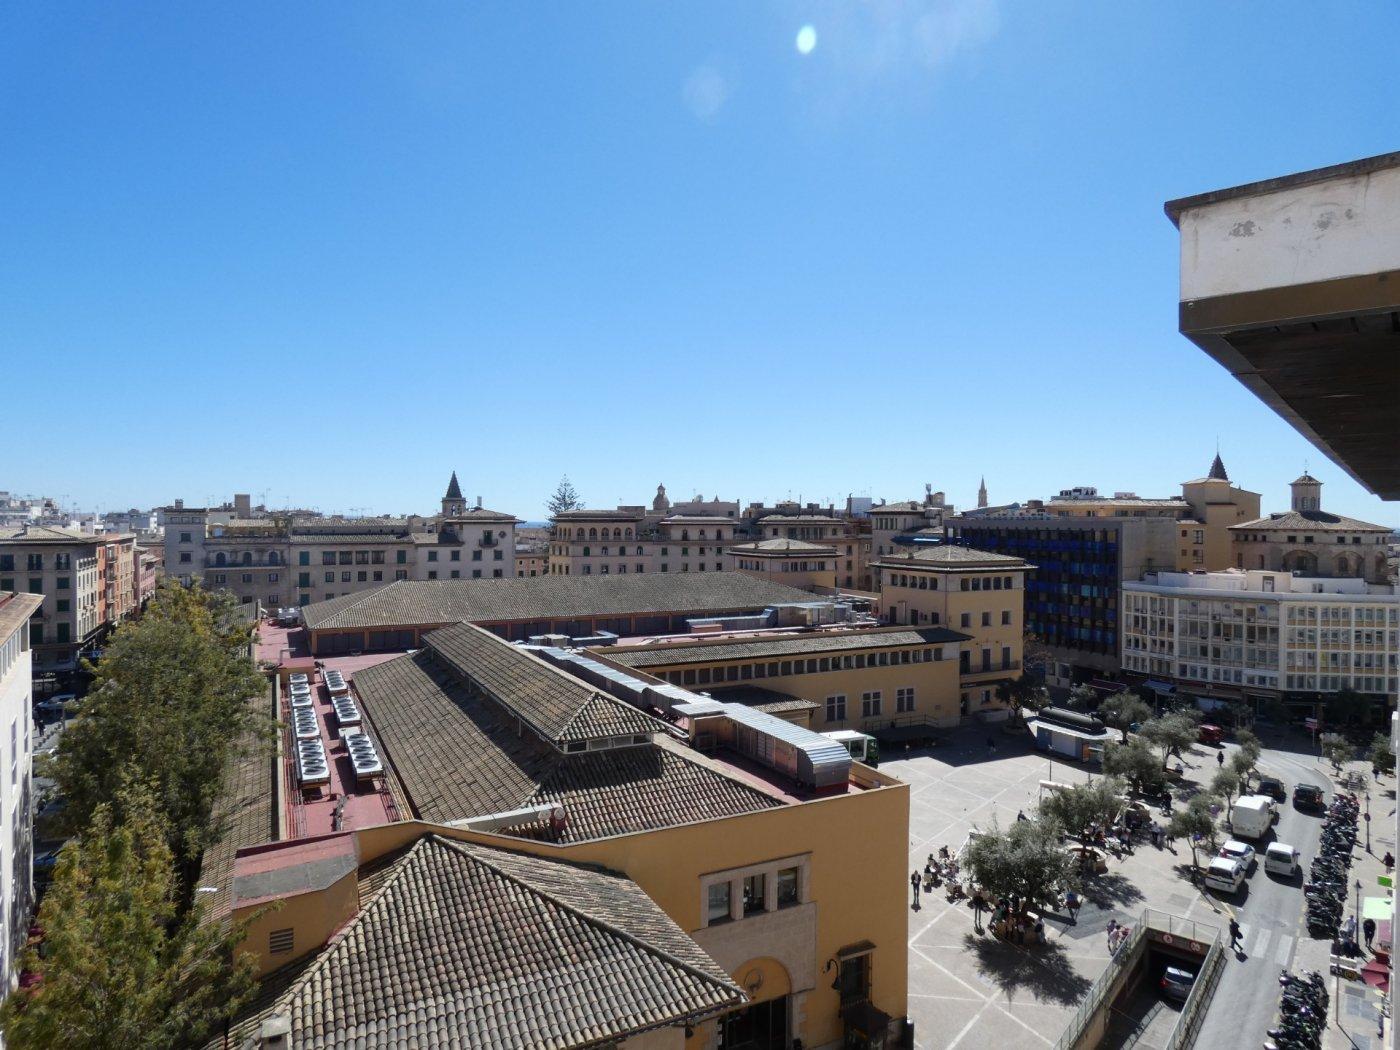 Despacho-Venta-Palma de Mallorca-185572-Foto-2